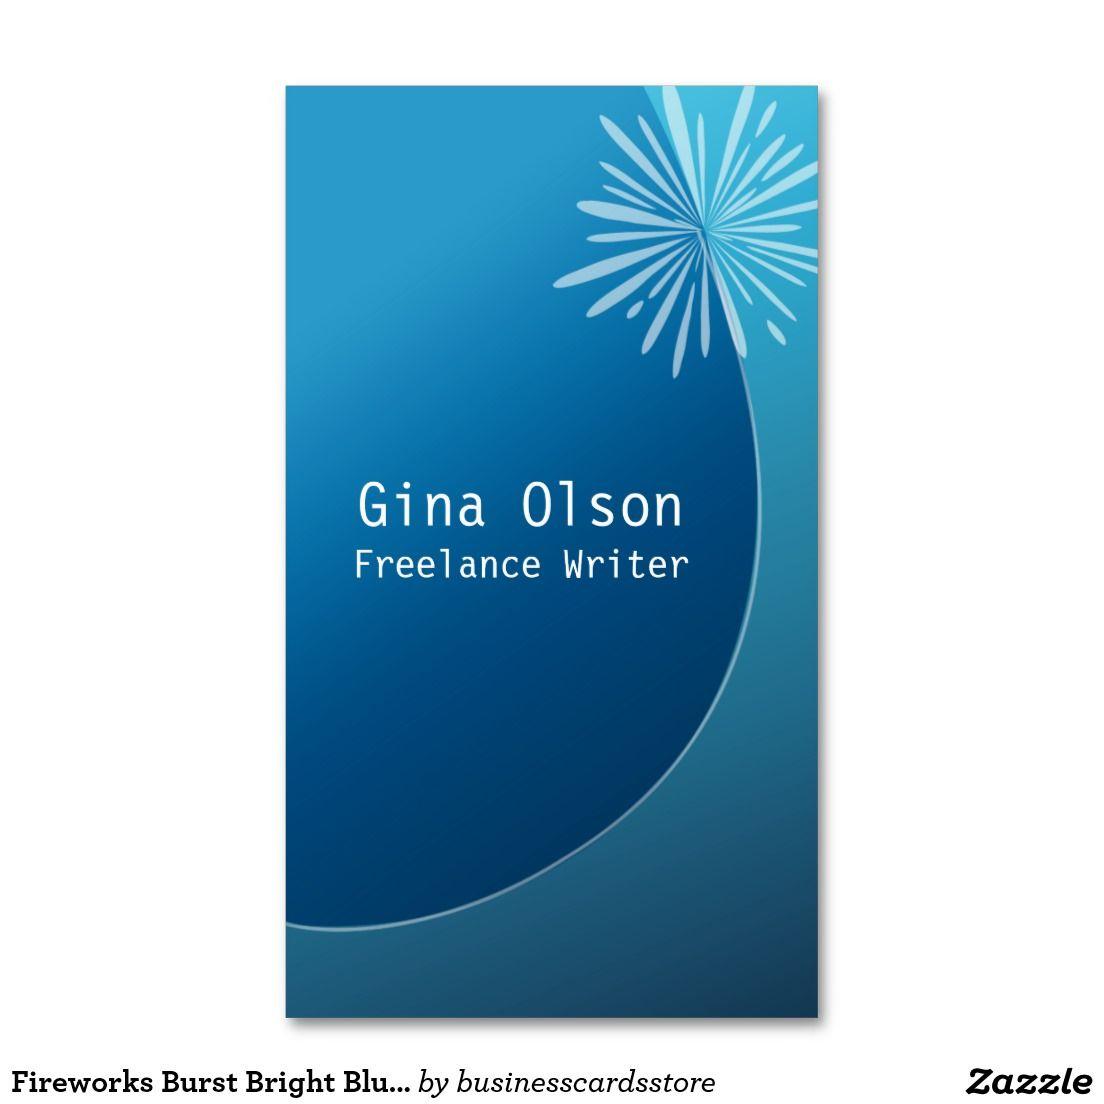 Fireworks Burst Bright Blue Business Cards Blue Business Card Business Card Design Business Card Template